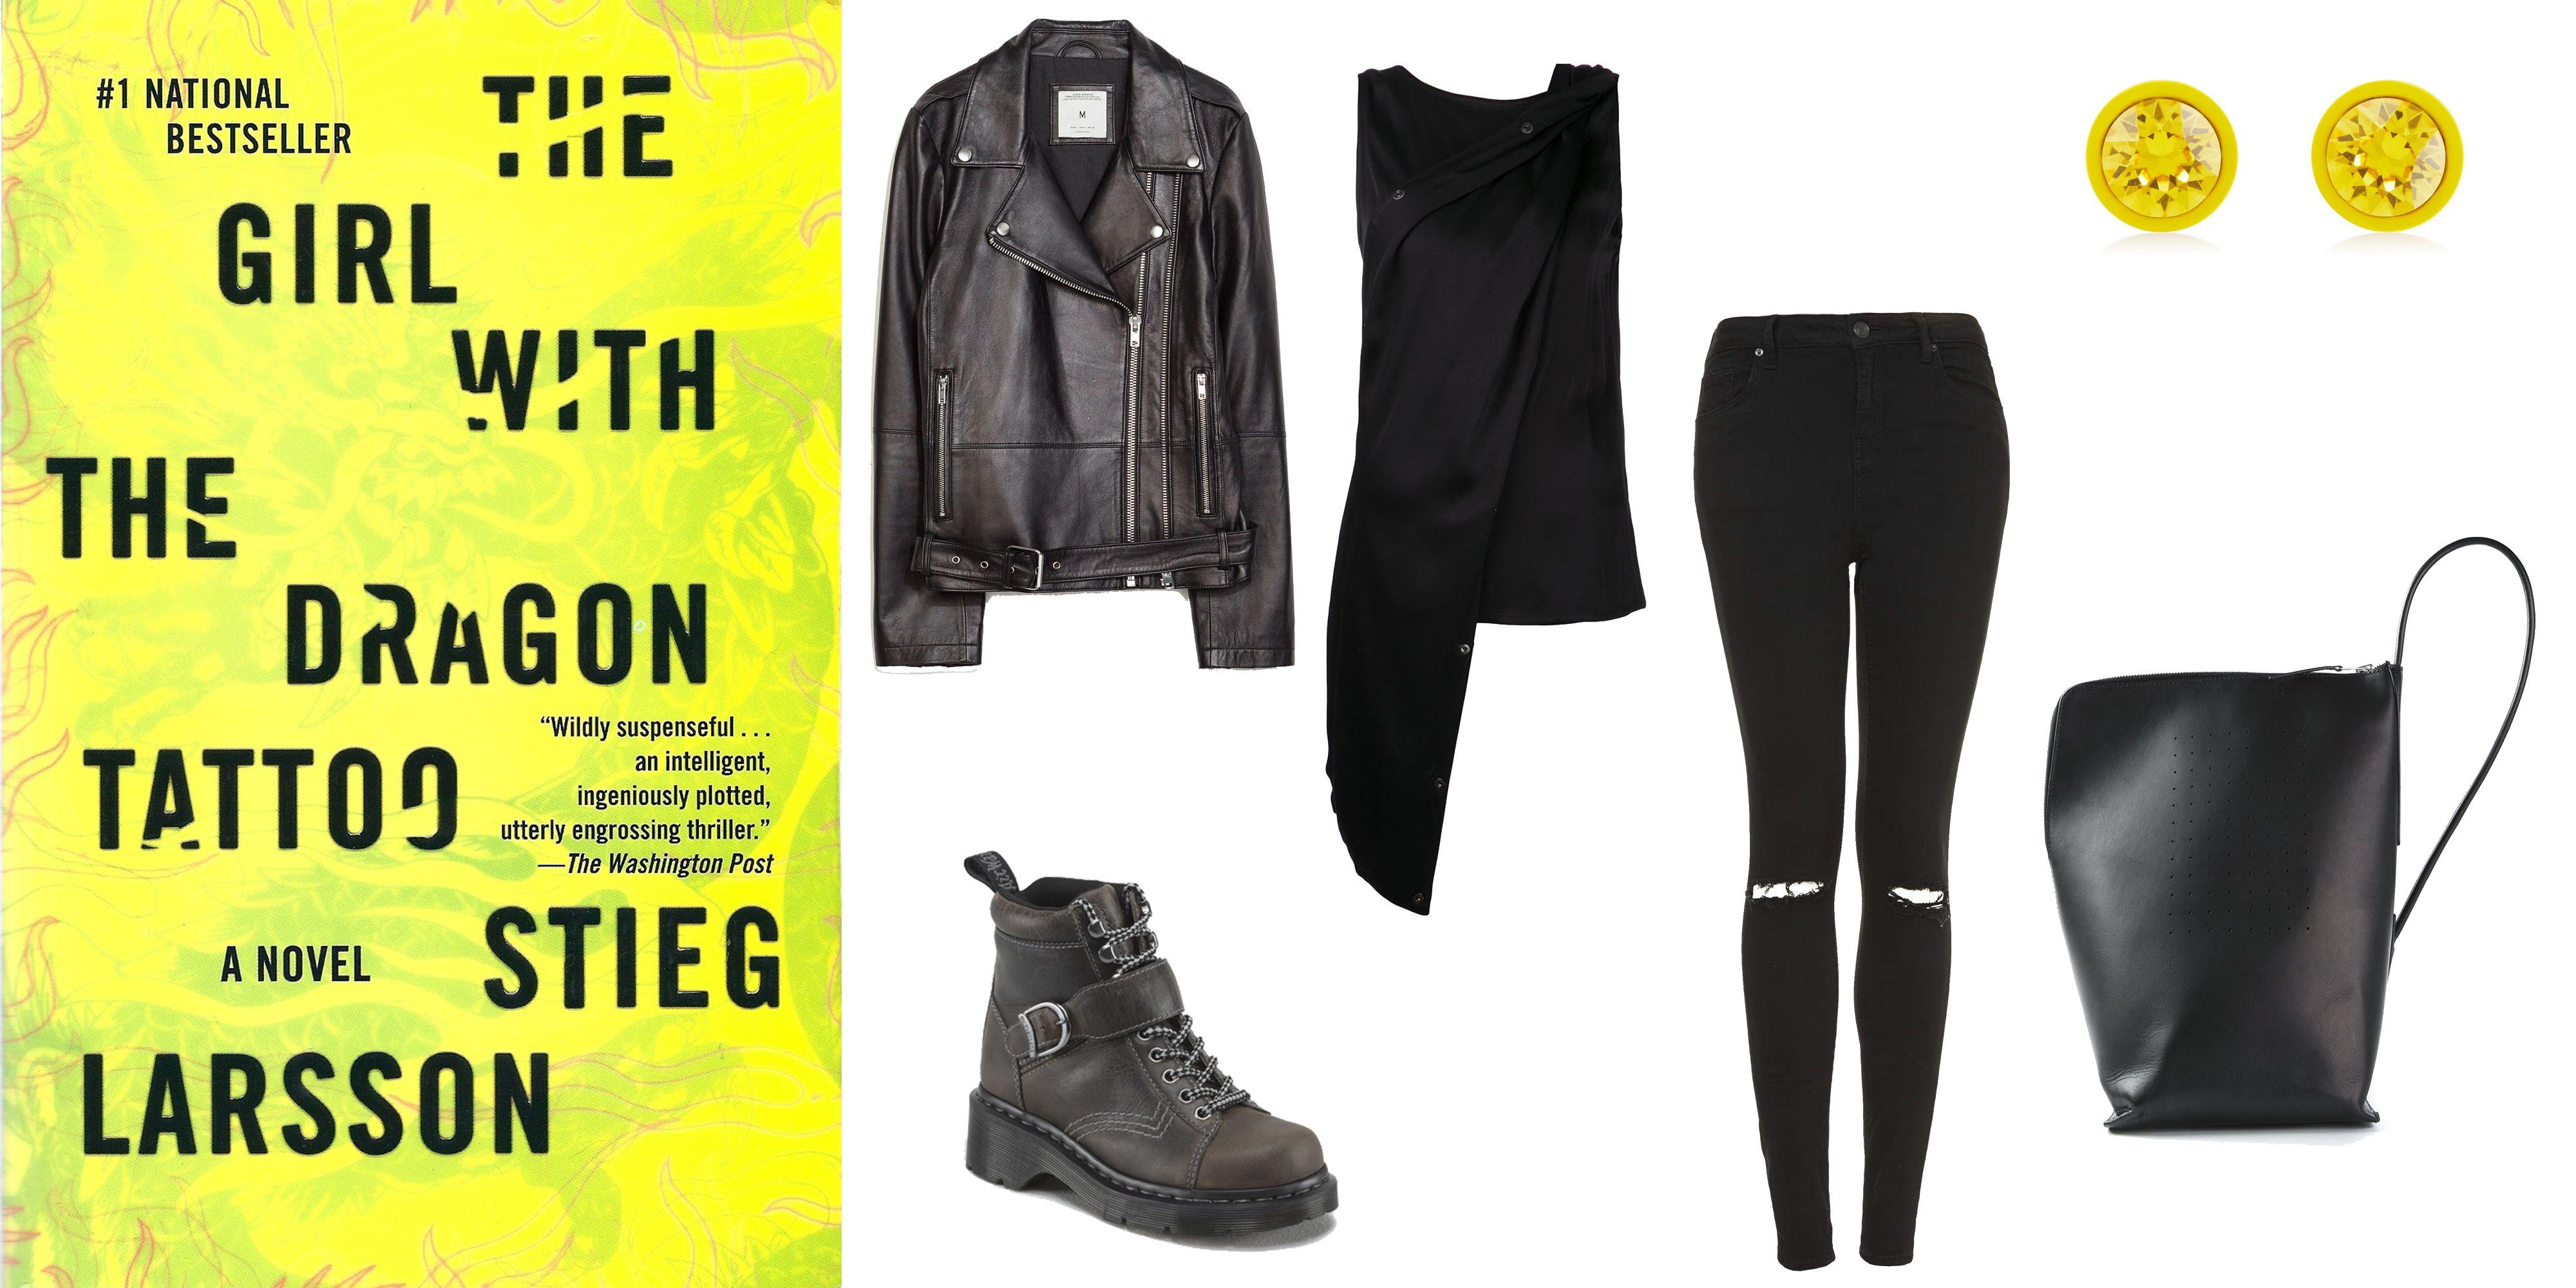 "Zara Zipped Leather Biker Jacket, $300;&amp;nbsp;&lt;a href=""http://www.zara.com/us/en/collection-ss15/woman/outerwear/zipped-leather-biker-jacket-c367501p2407017.html""&gt;zara.com&lt;/a&gt;  Topshop Moto Black Ripped Jamie Jeans, $75;&amp;nbsp;&lt;a href=""http://us.topshop.com/en/tsus/product/clothing-70483/denim-2622336/moto-black-ripped-jamie-jeans-3180373?bi=1&amp;amp;ps=200""&gt;topshop.com&lt;/a&gt;  Rick Owens Bucket Shoulder Bag, $1,400;&amp;nbsp;&lt;a href=""http://www.farfetch.com/in/shopping/women/rick-owens-bucket-shoulder-bag-item-10613763.aspx?storeid=9653&amp;amp;ffref=lp_113_""&gt;farfetch.com&lt;/a&gt;  Dr. Martens Katherine Boots, $130;&amp;nbsp;&lt;a href=""http://www.drmartens.com/us/Womens/KATHERINE/p/16128001""&gt;drmartens.com&lt;/a&gt;  Ann Demeulemeester Draped Tank Tio, $1085;&lt;a href=""http://www.farfetch.com/in/shopping/women/ann-demeulemeester-draped-tank-top-item-10849223.aspx?storeid=9331&amp;amp;ffref=lp_49_""&gt;farfetch.com&lt;/a&gt;  Givenchy Lacquered Metal and Crystal Earrings,$515; &lt;a href=""http://www.net-a-porter.com/product/430376/Givenchy/yellow-lacquered-metal-and-crystal-small-earrings""&gt;net-a-porter.com&lt;/a&gt;  <!--EndFragment-->"